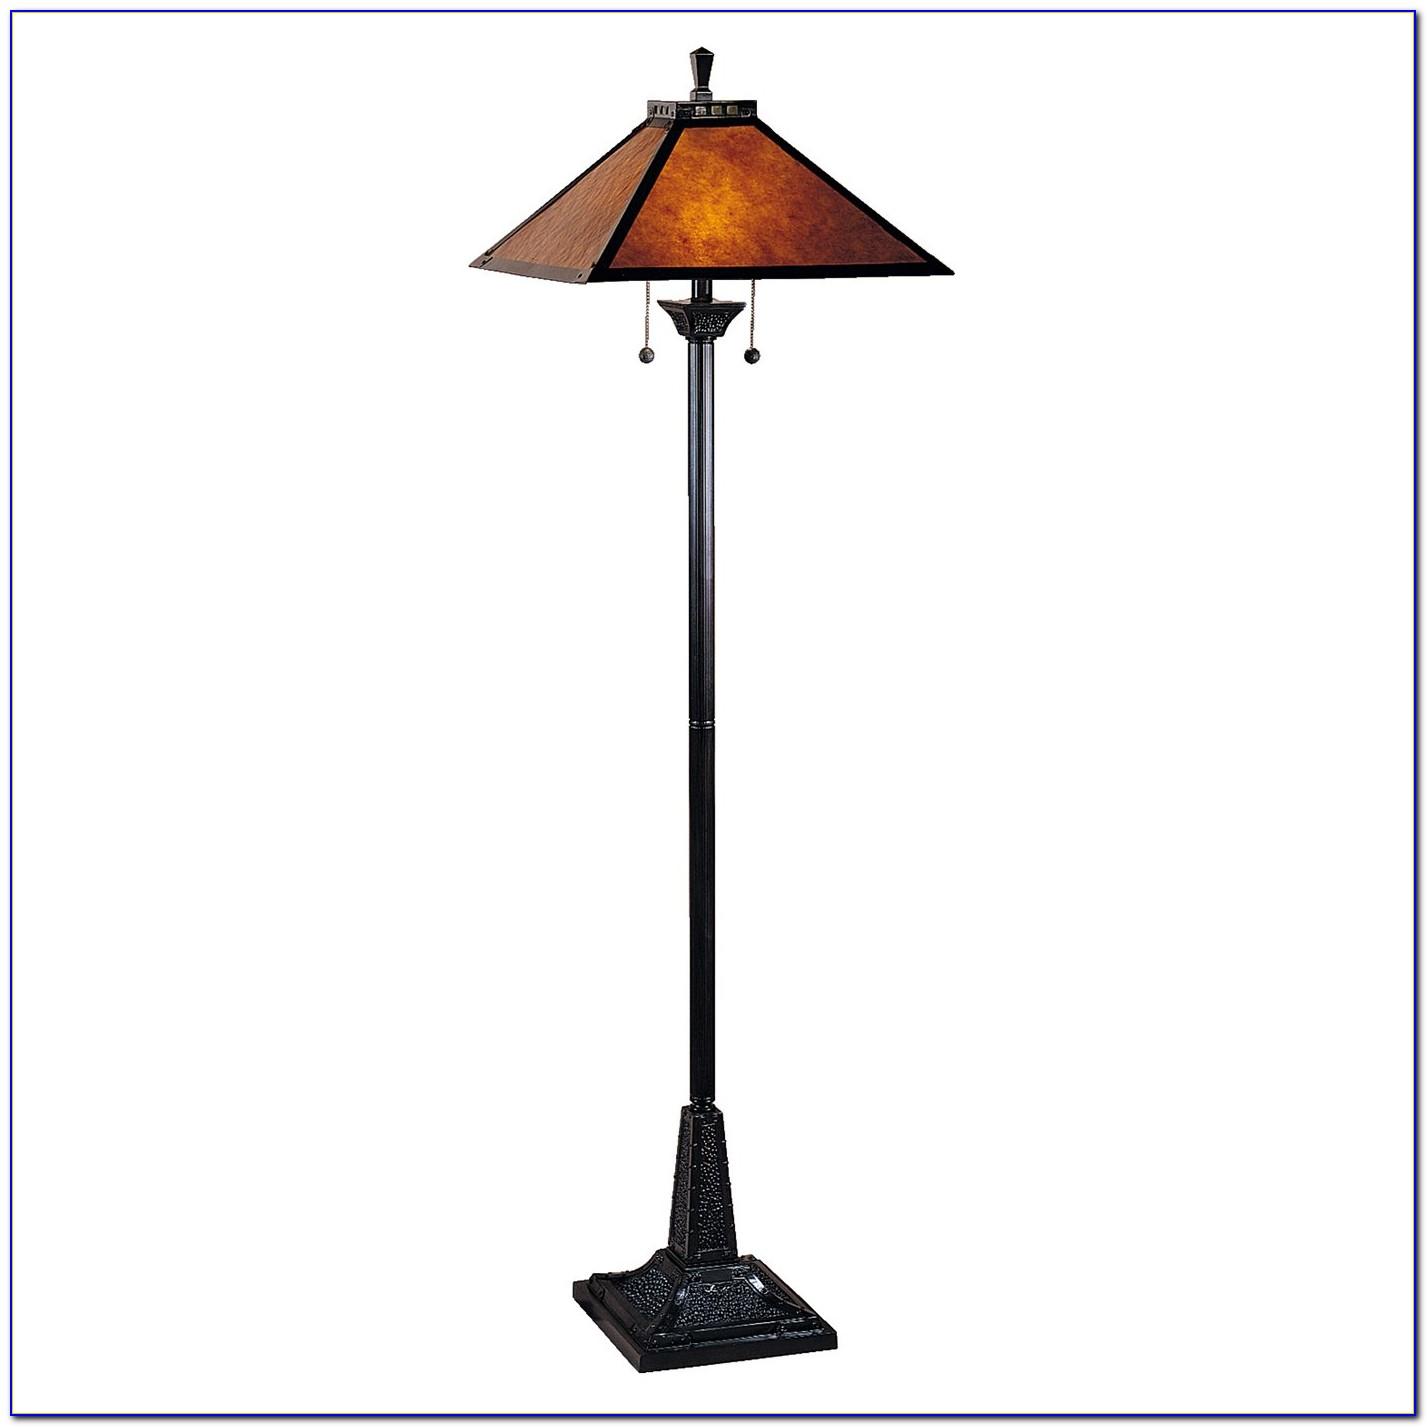 Dale Tiffany Peacock Floor Lamp